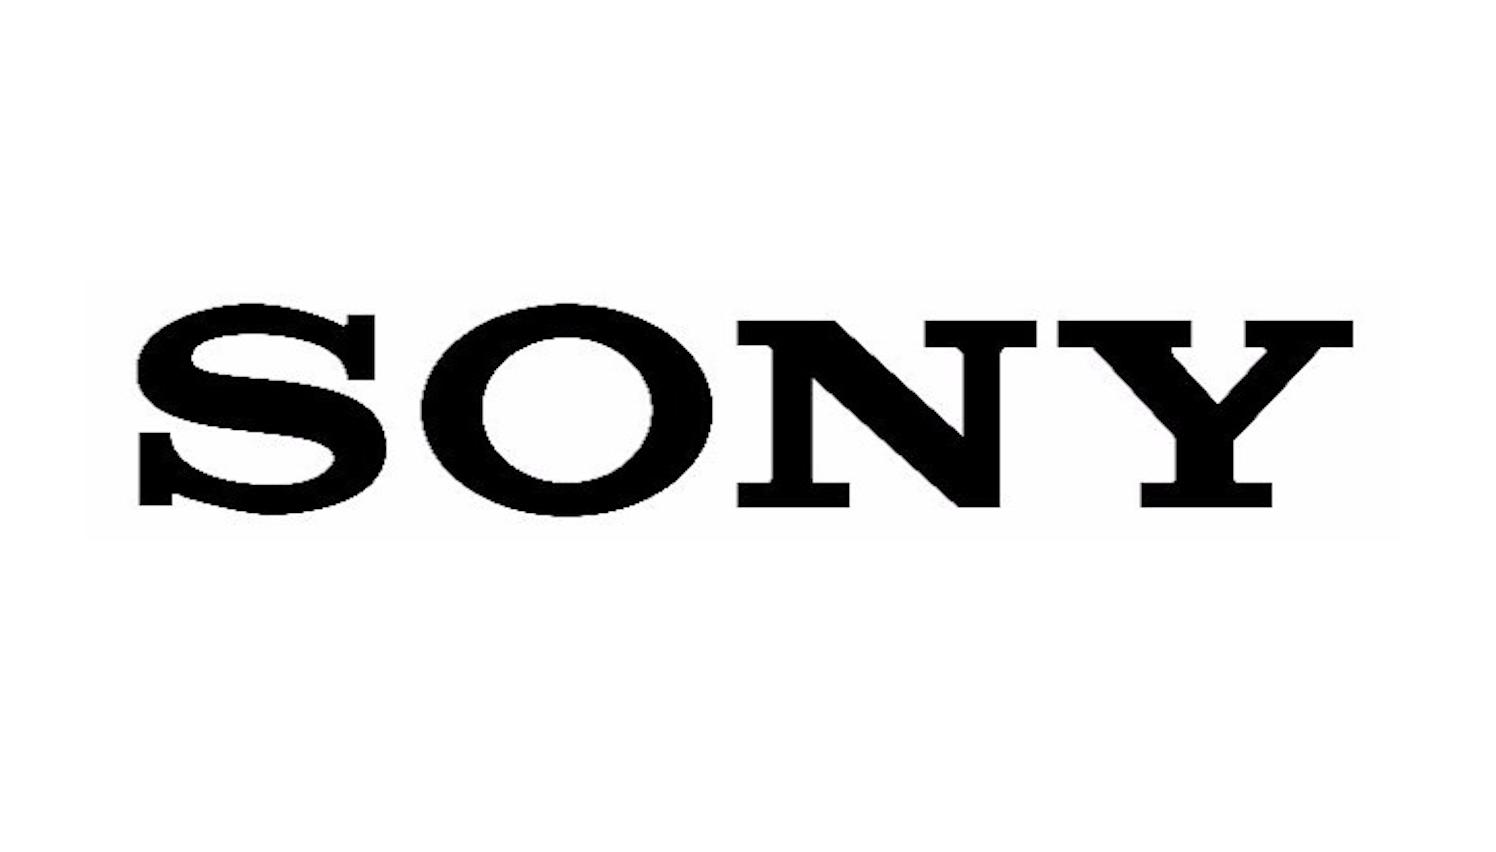 SONY(ソニー) ログインシステム ブロックチェーン